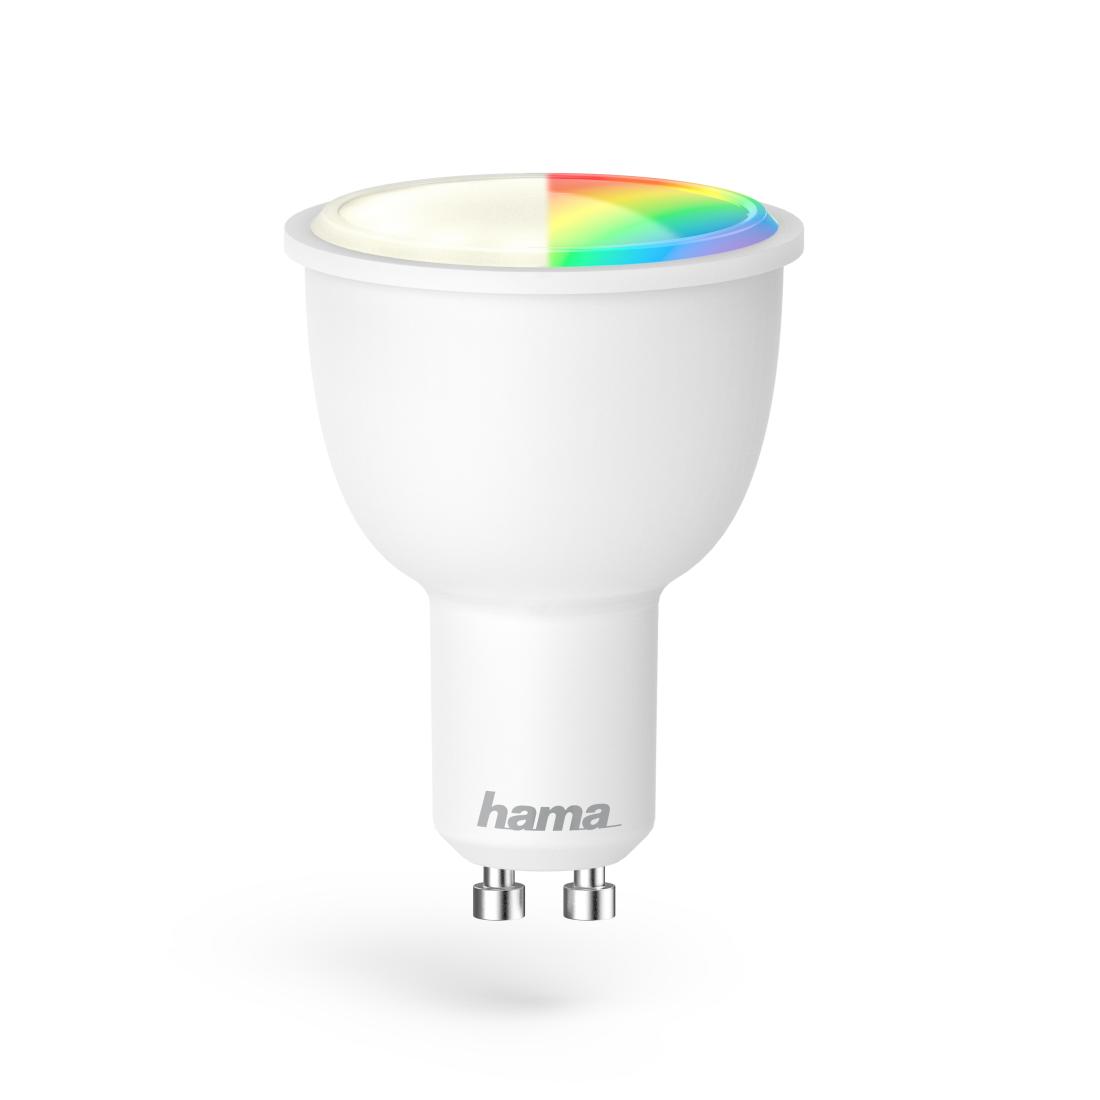 hama.de | 00176532 Hama WiFi-LED-Lampe, GU10, 4,5W, RGB, dimmbar ...